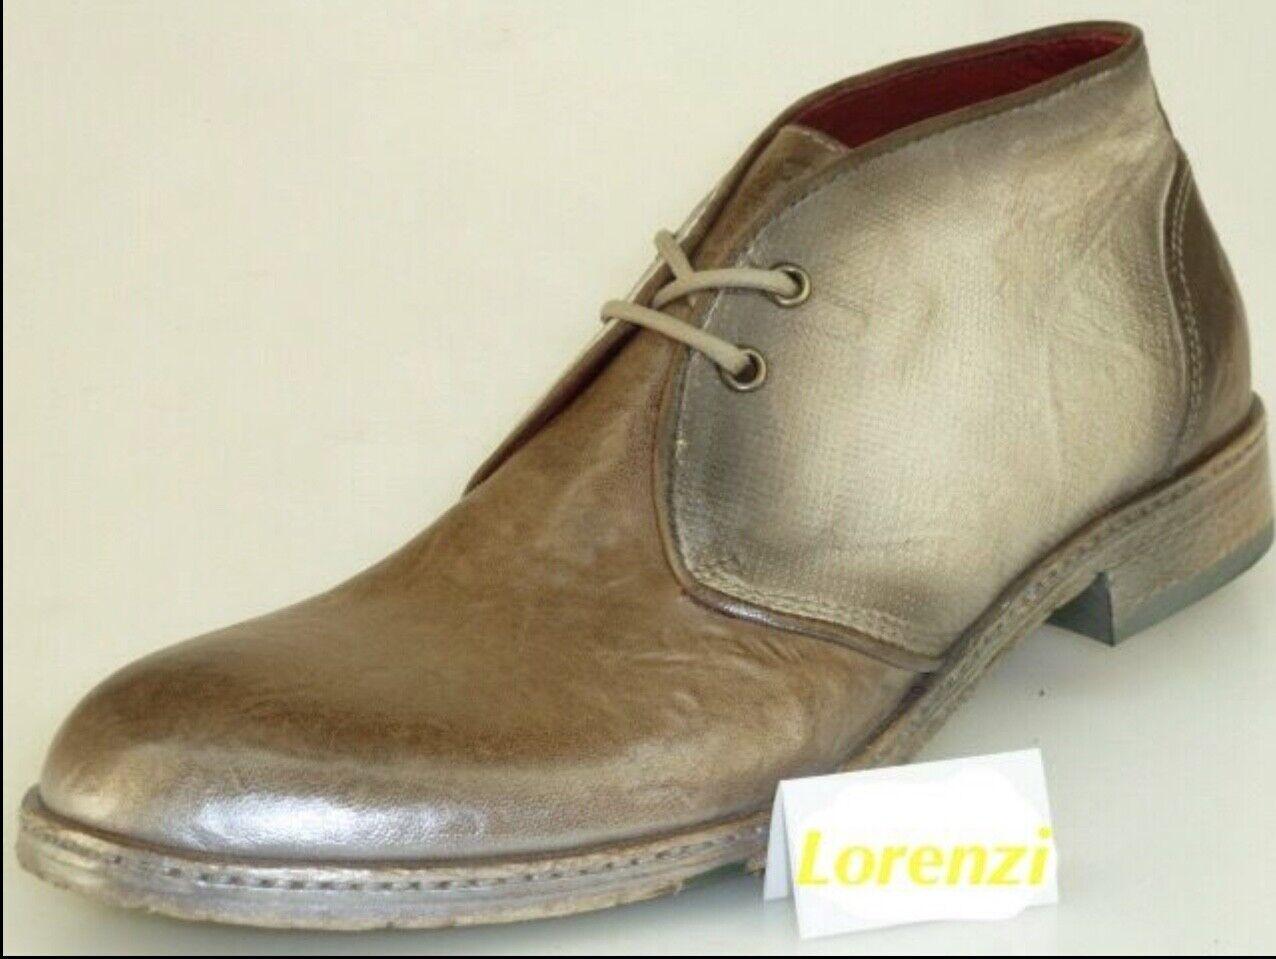 Lorenzi schuhe Leather Handmade  Stiefel Lace Up Italian Stiefel EUR 42   43